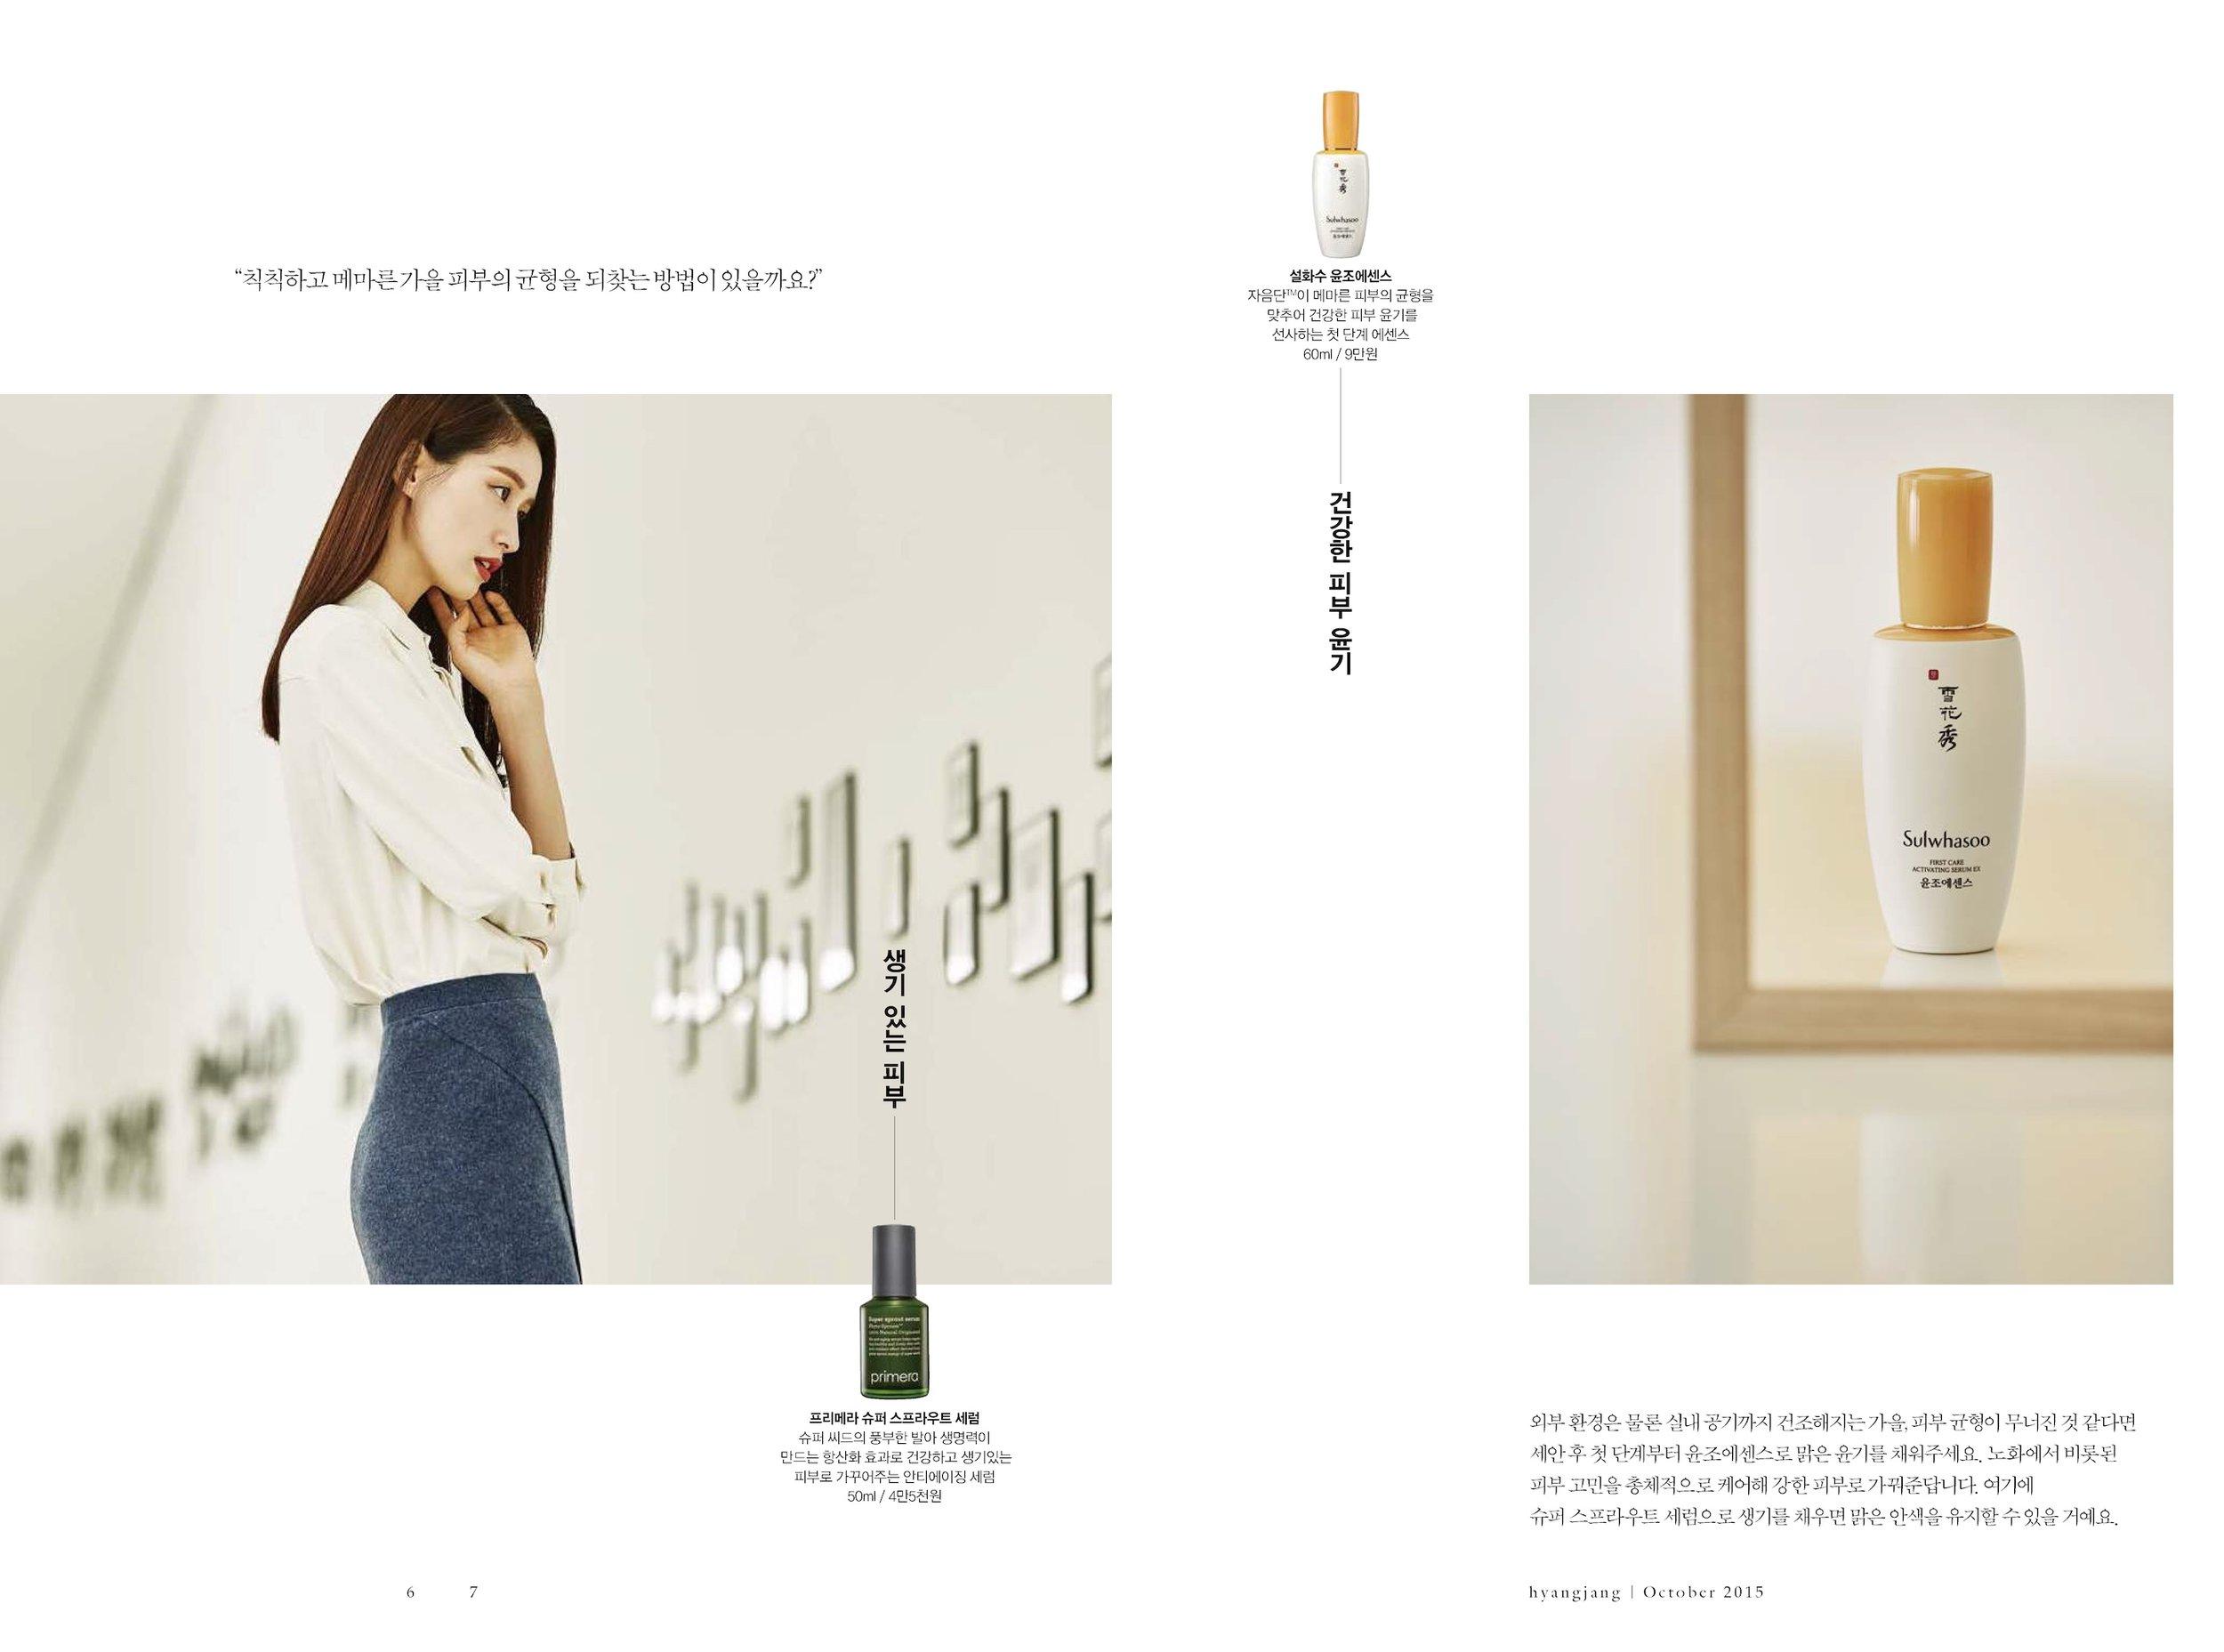 hyangjang-201510_페이지_03.jpeg